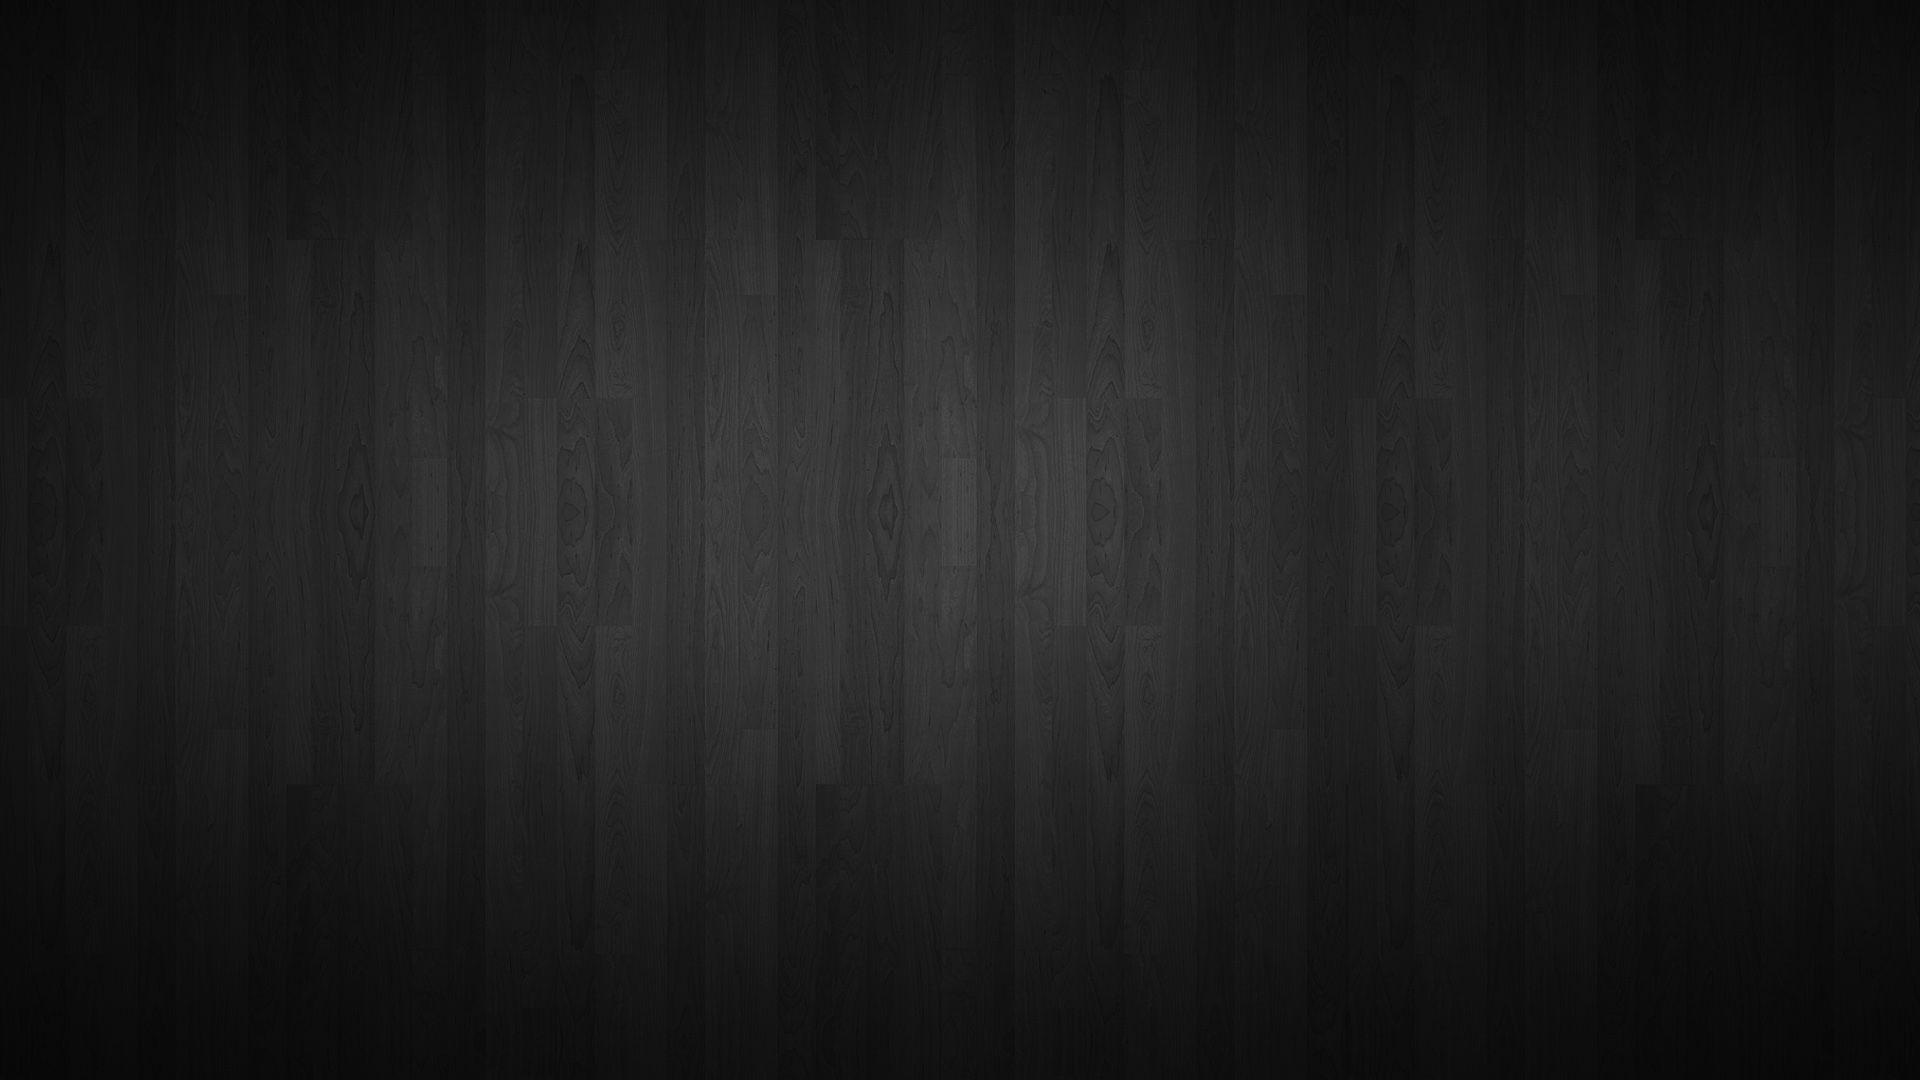 Hd wallpaper wood - Wallpapers For White Wood Grain Wallpaper